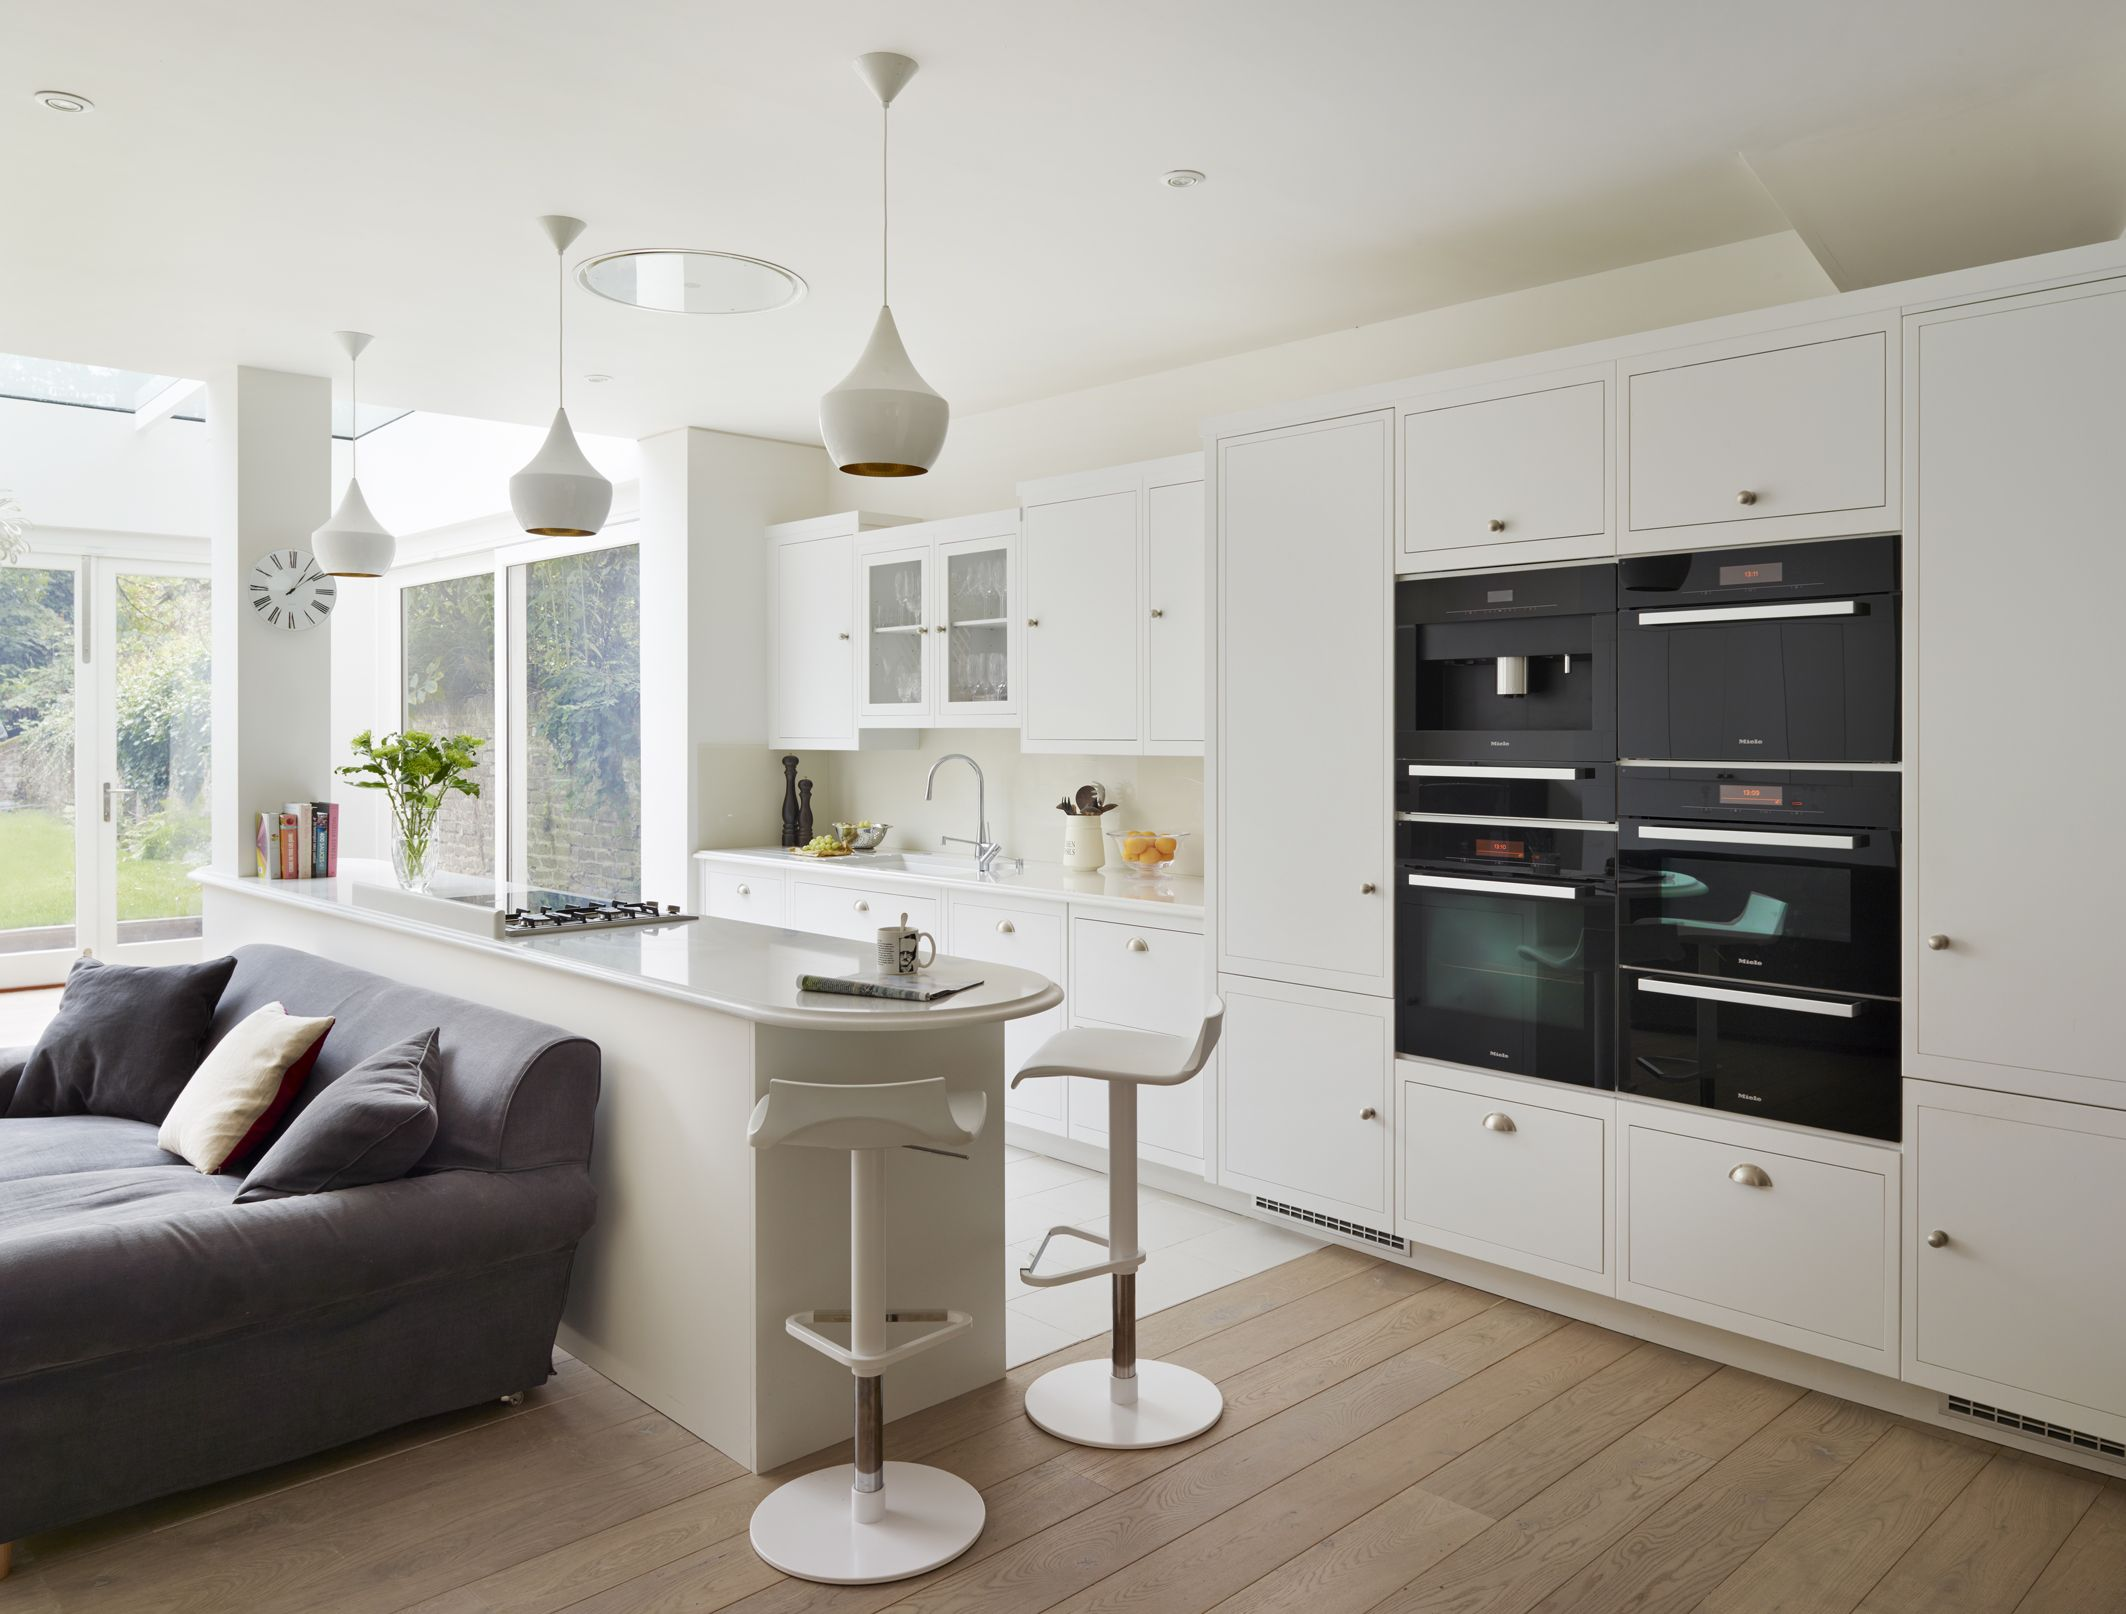 dulux kitchen plus willow tree - paint - 2.5l | kitchen